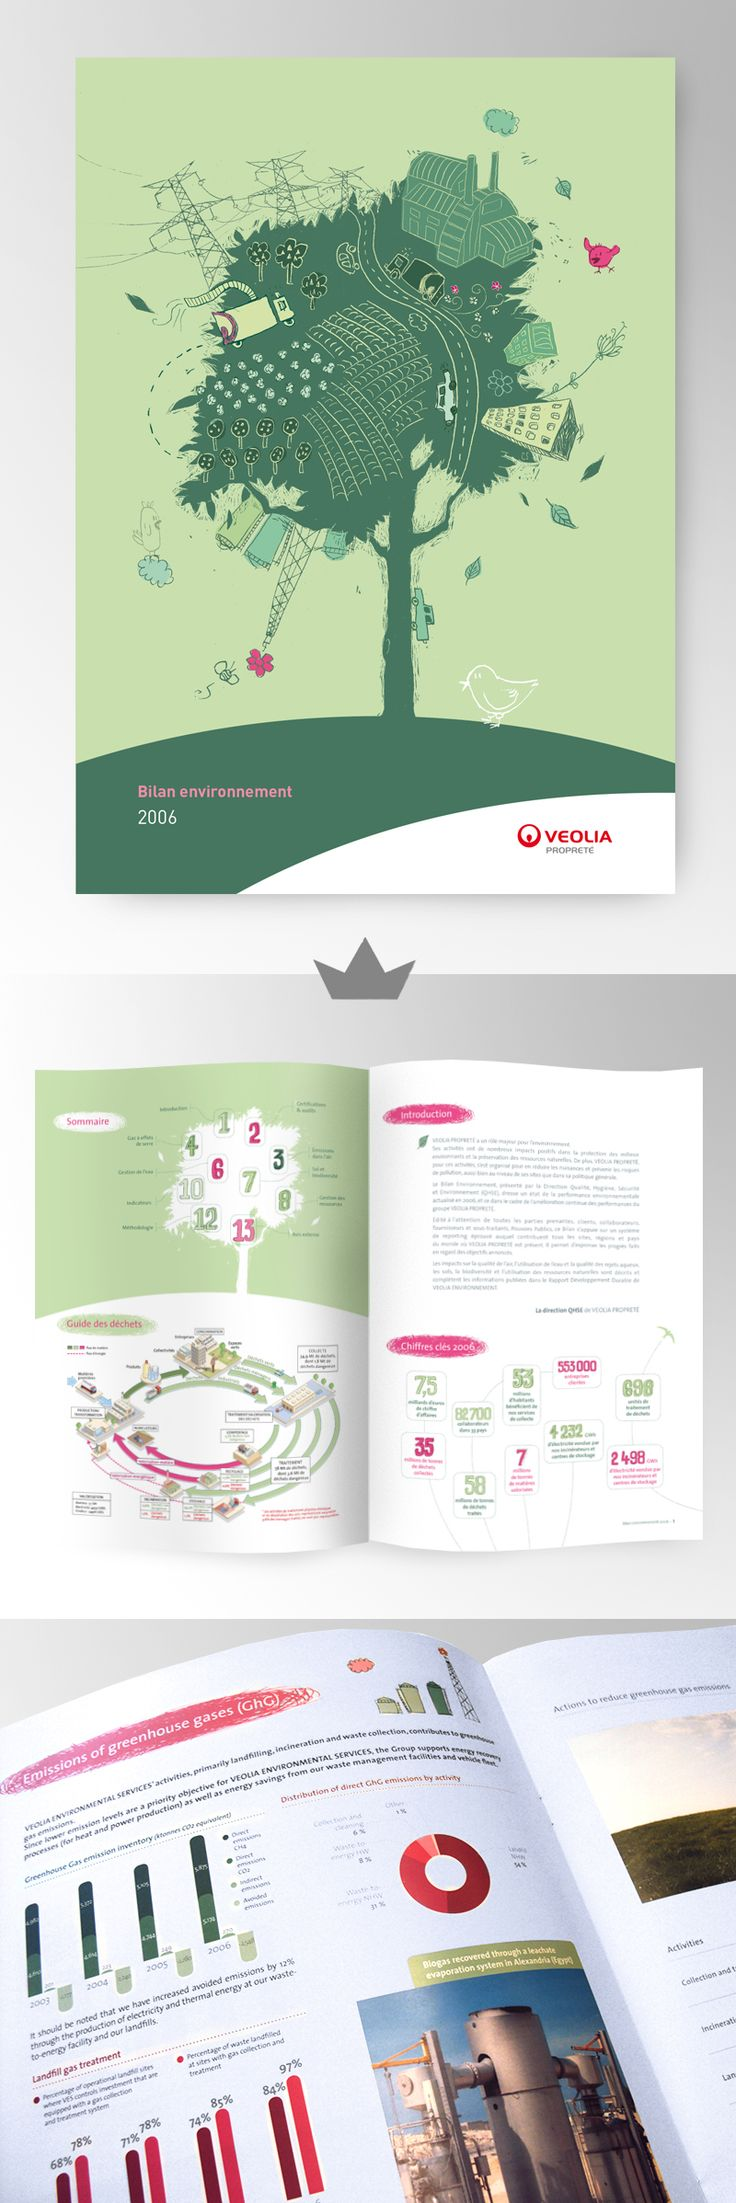 VEOLIA - Rapport annuel 2006  (Bilan environnemental)